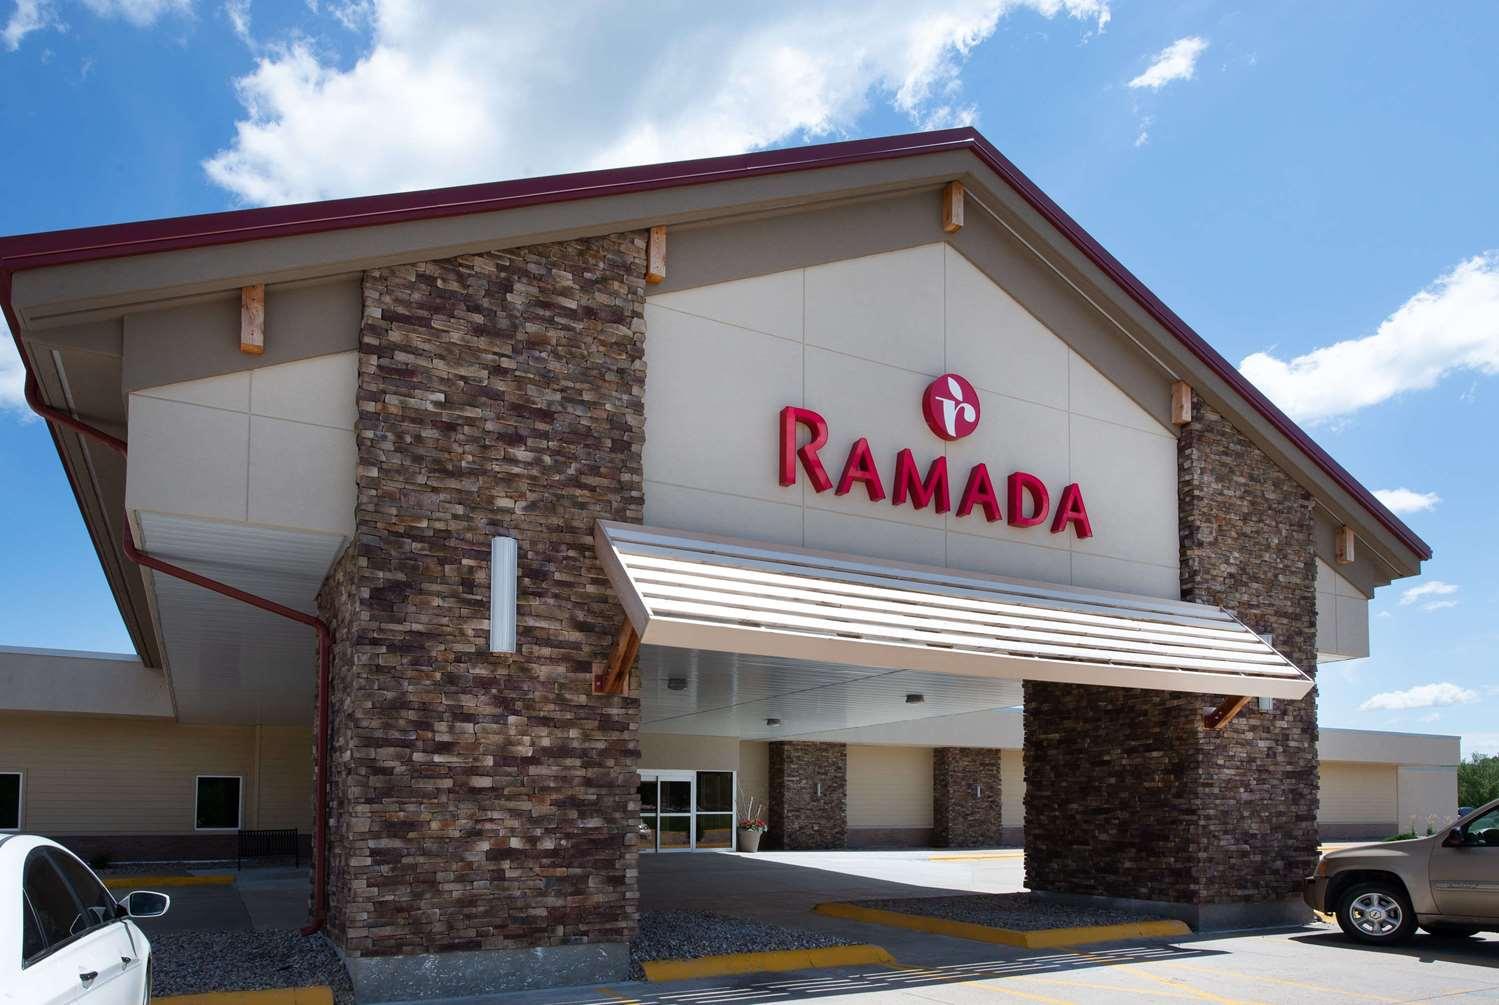 Ramada Columbus Hotel & Conference Center